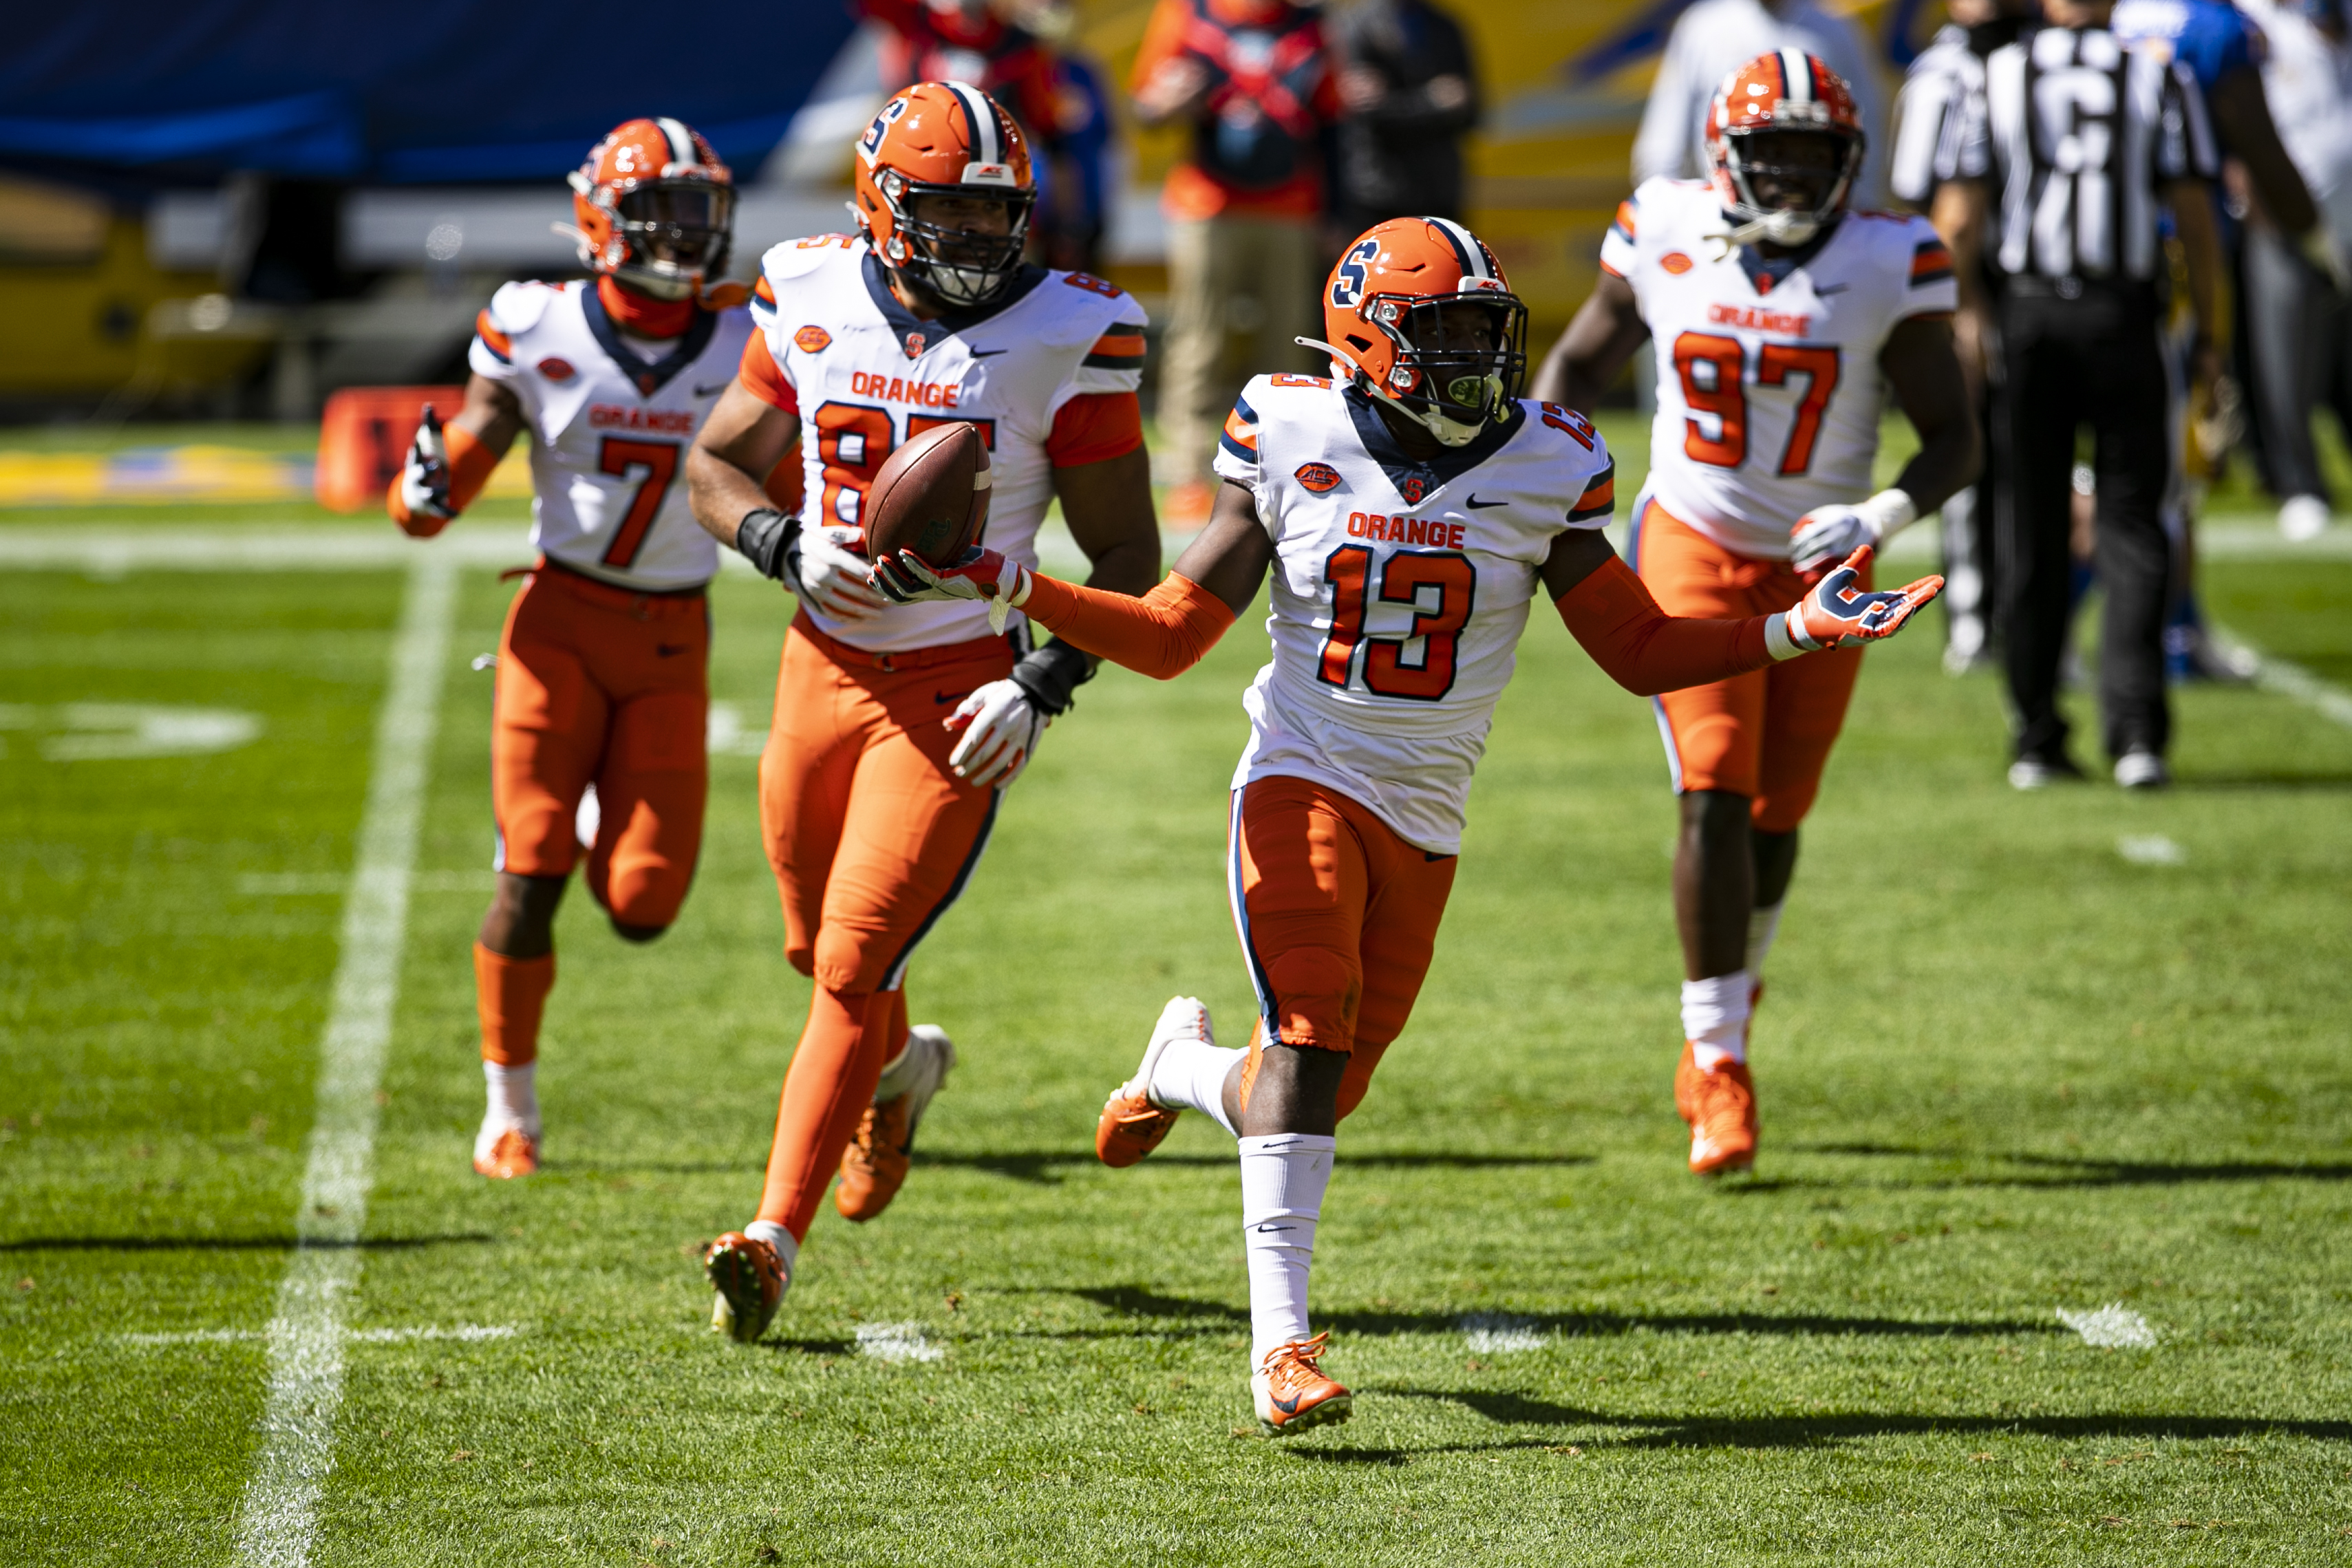 COLLEGE FOOTBALL: SEP 19 Syracuse at Pitt